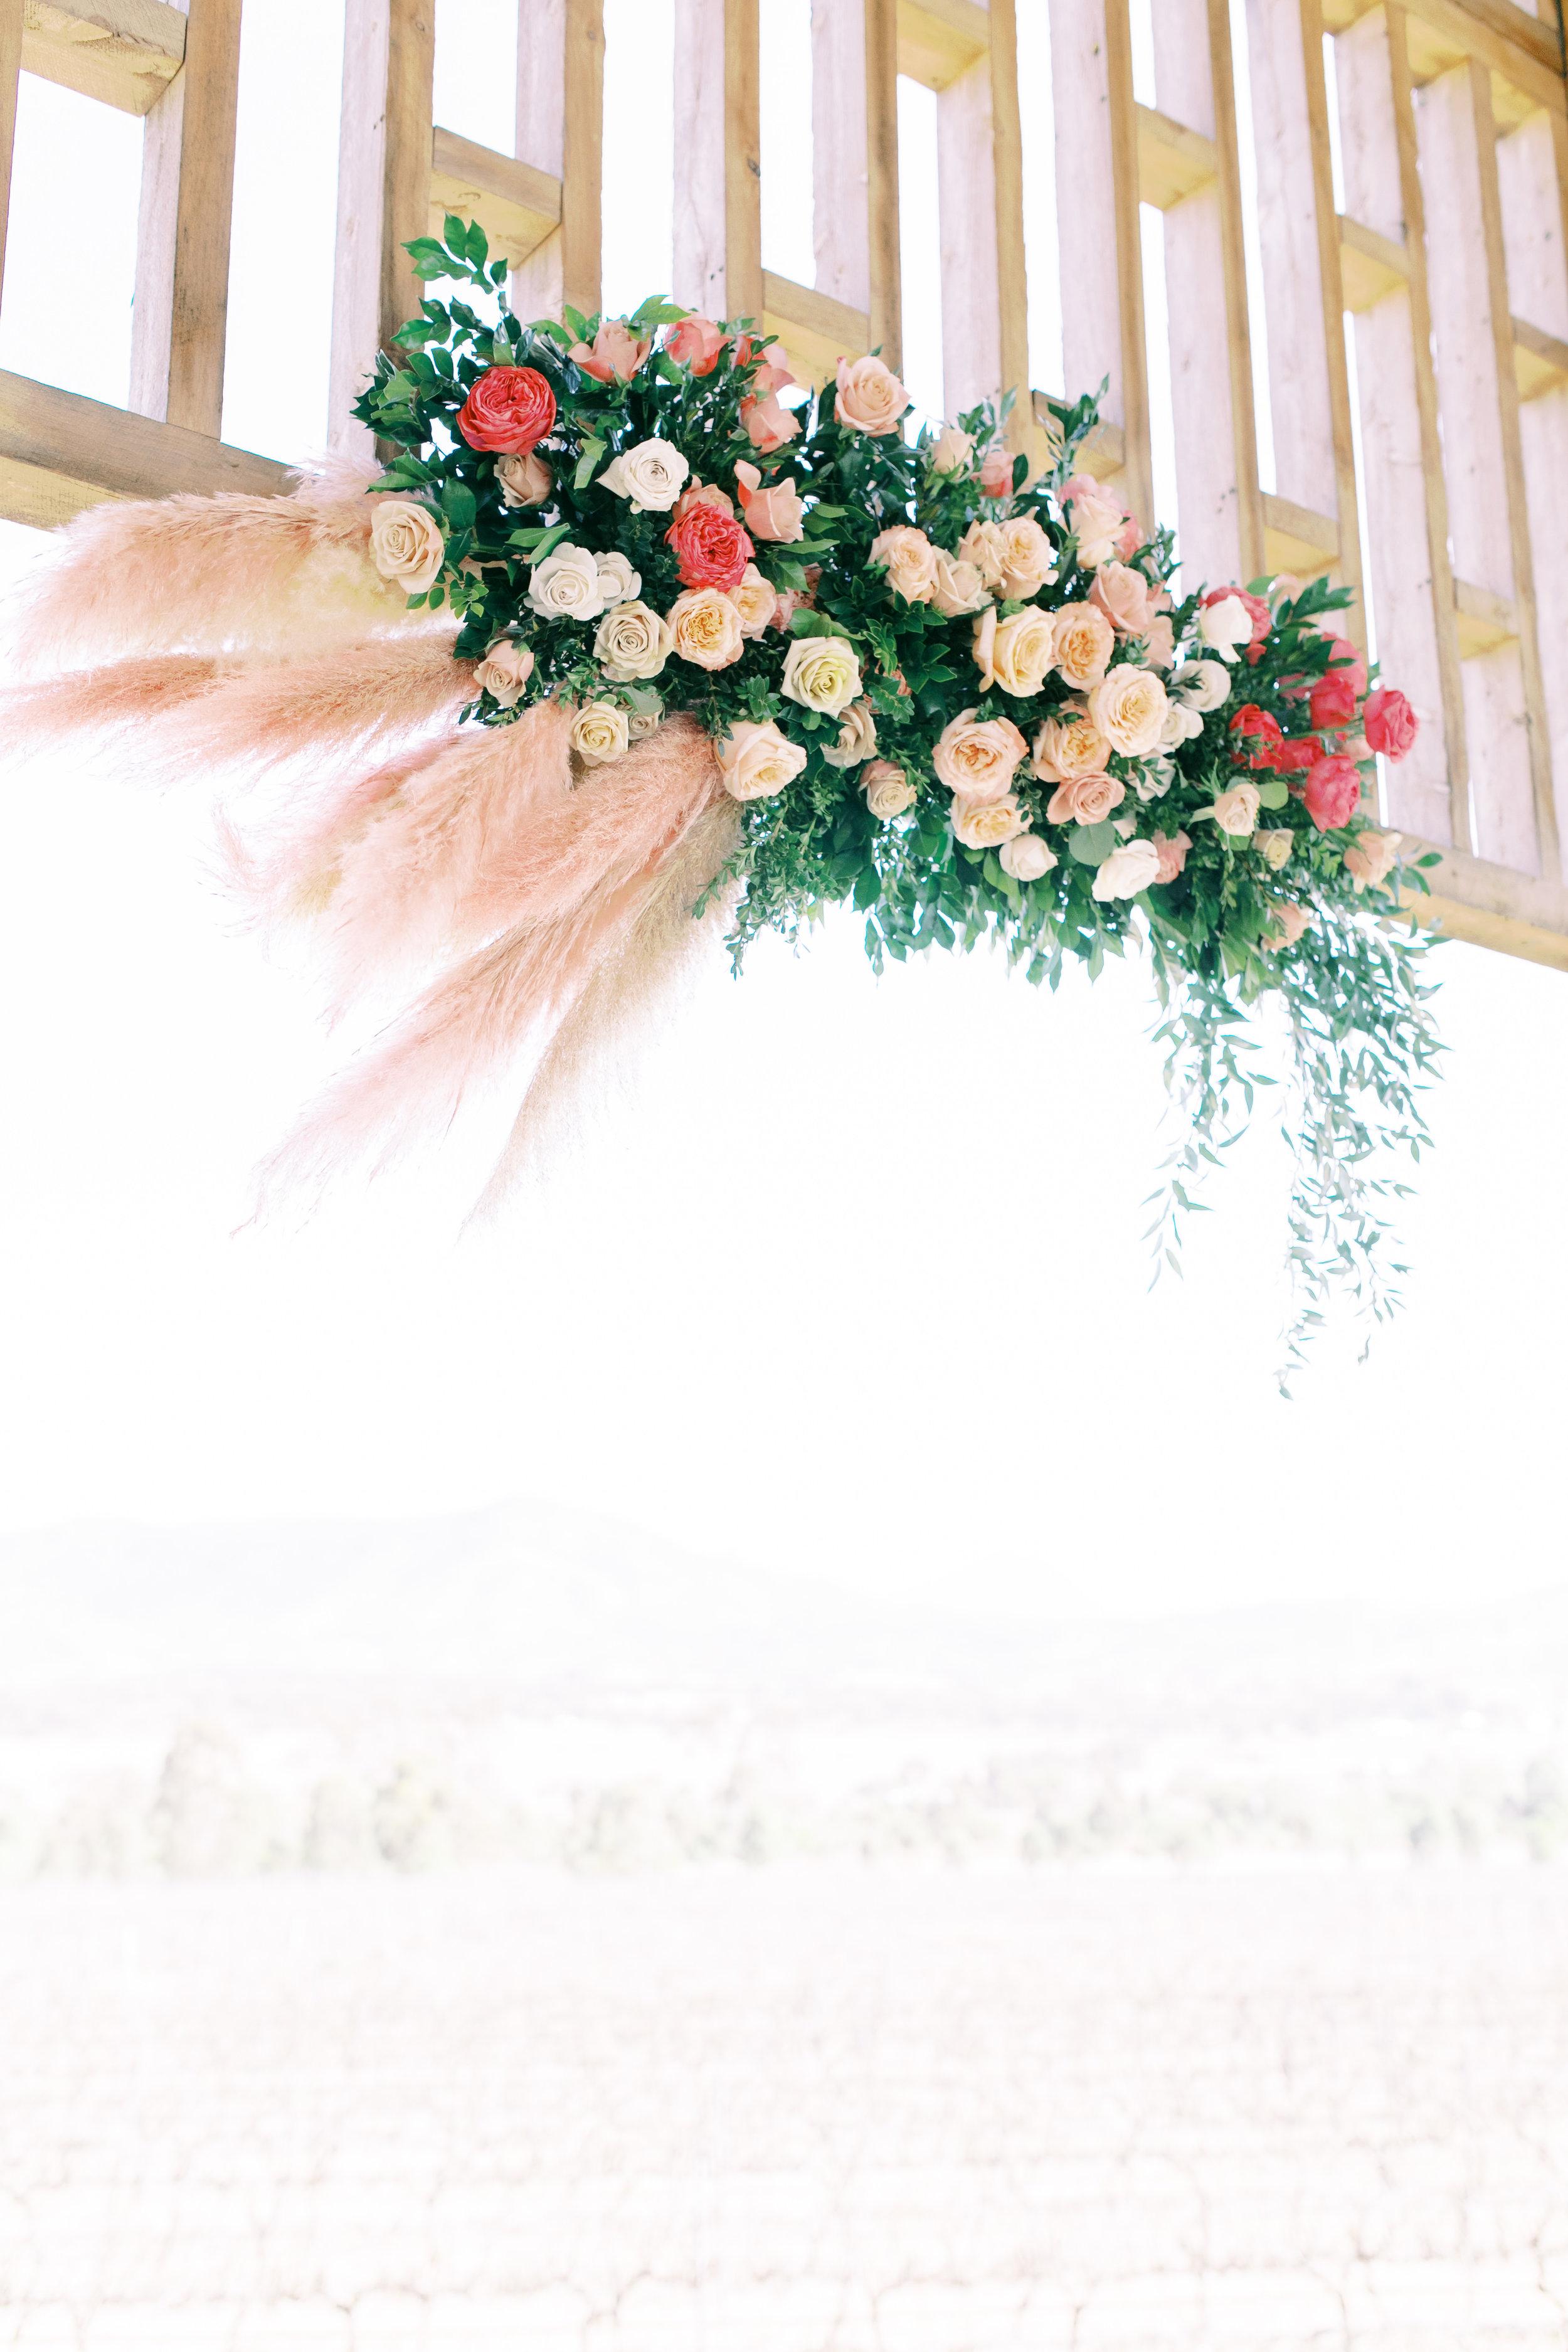 Kooroomba-Vineyard-Lavender-Farm-Wedding-Fine-Art-Lauren-Olivia-36.jpg